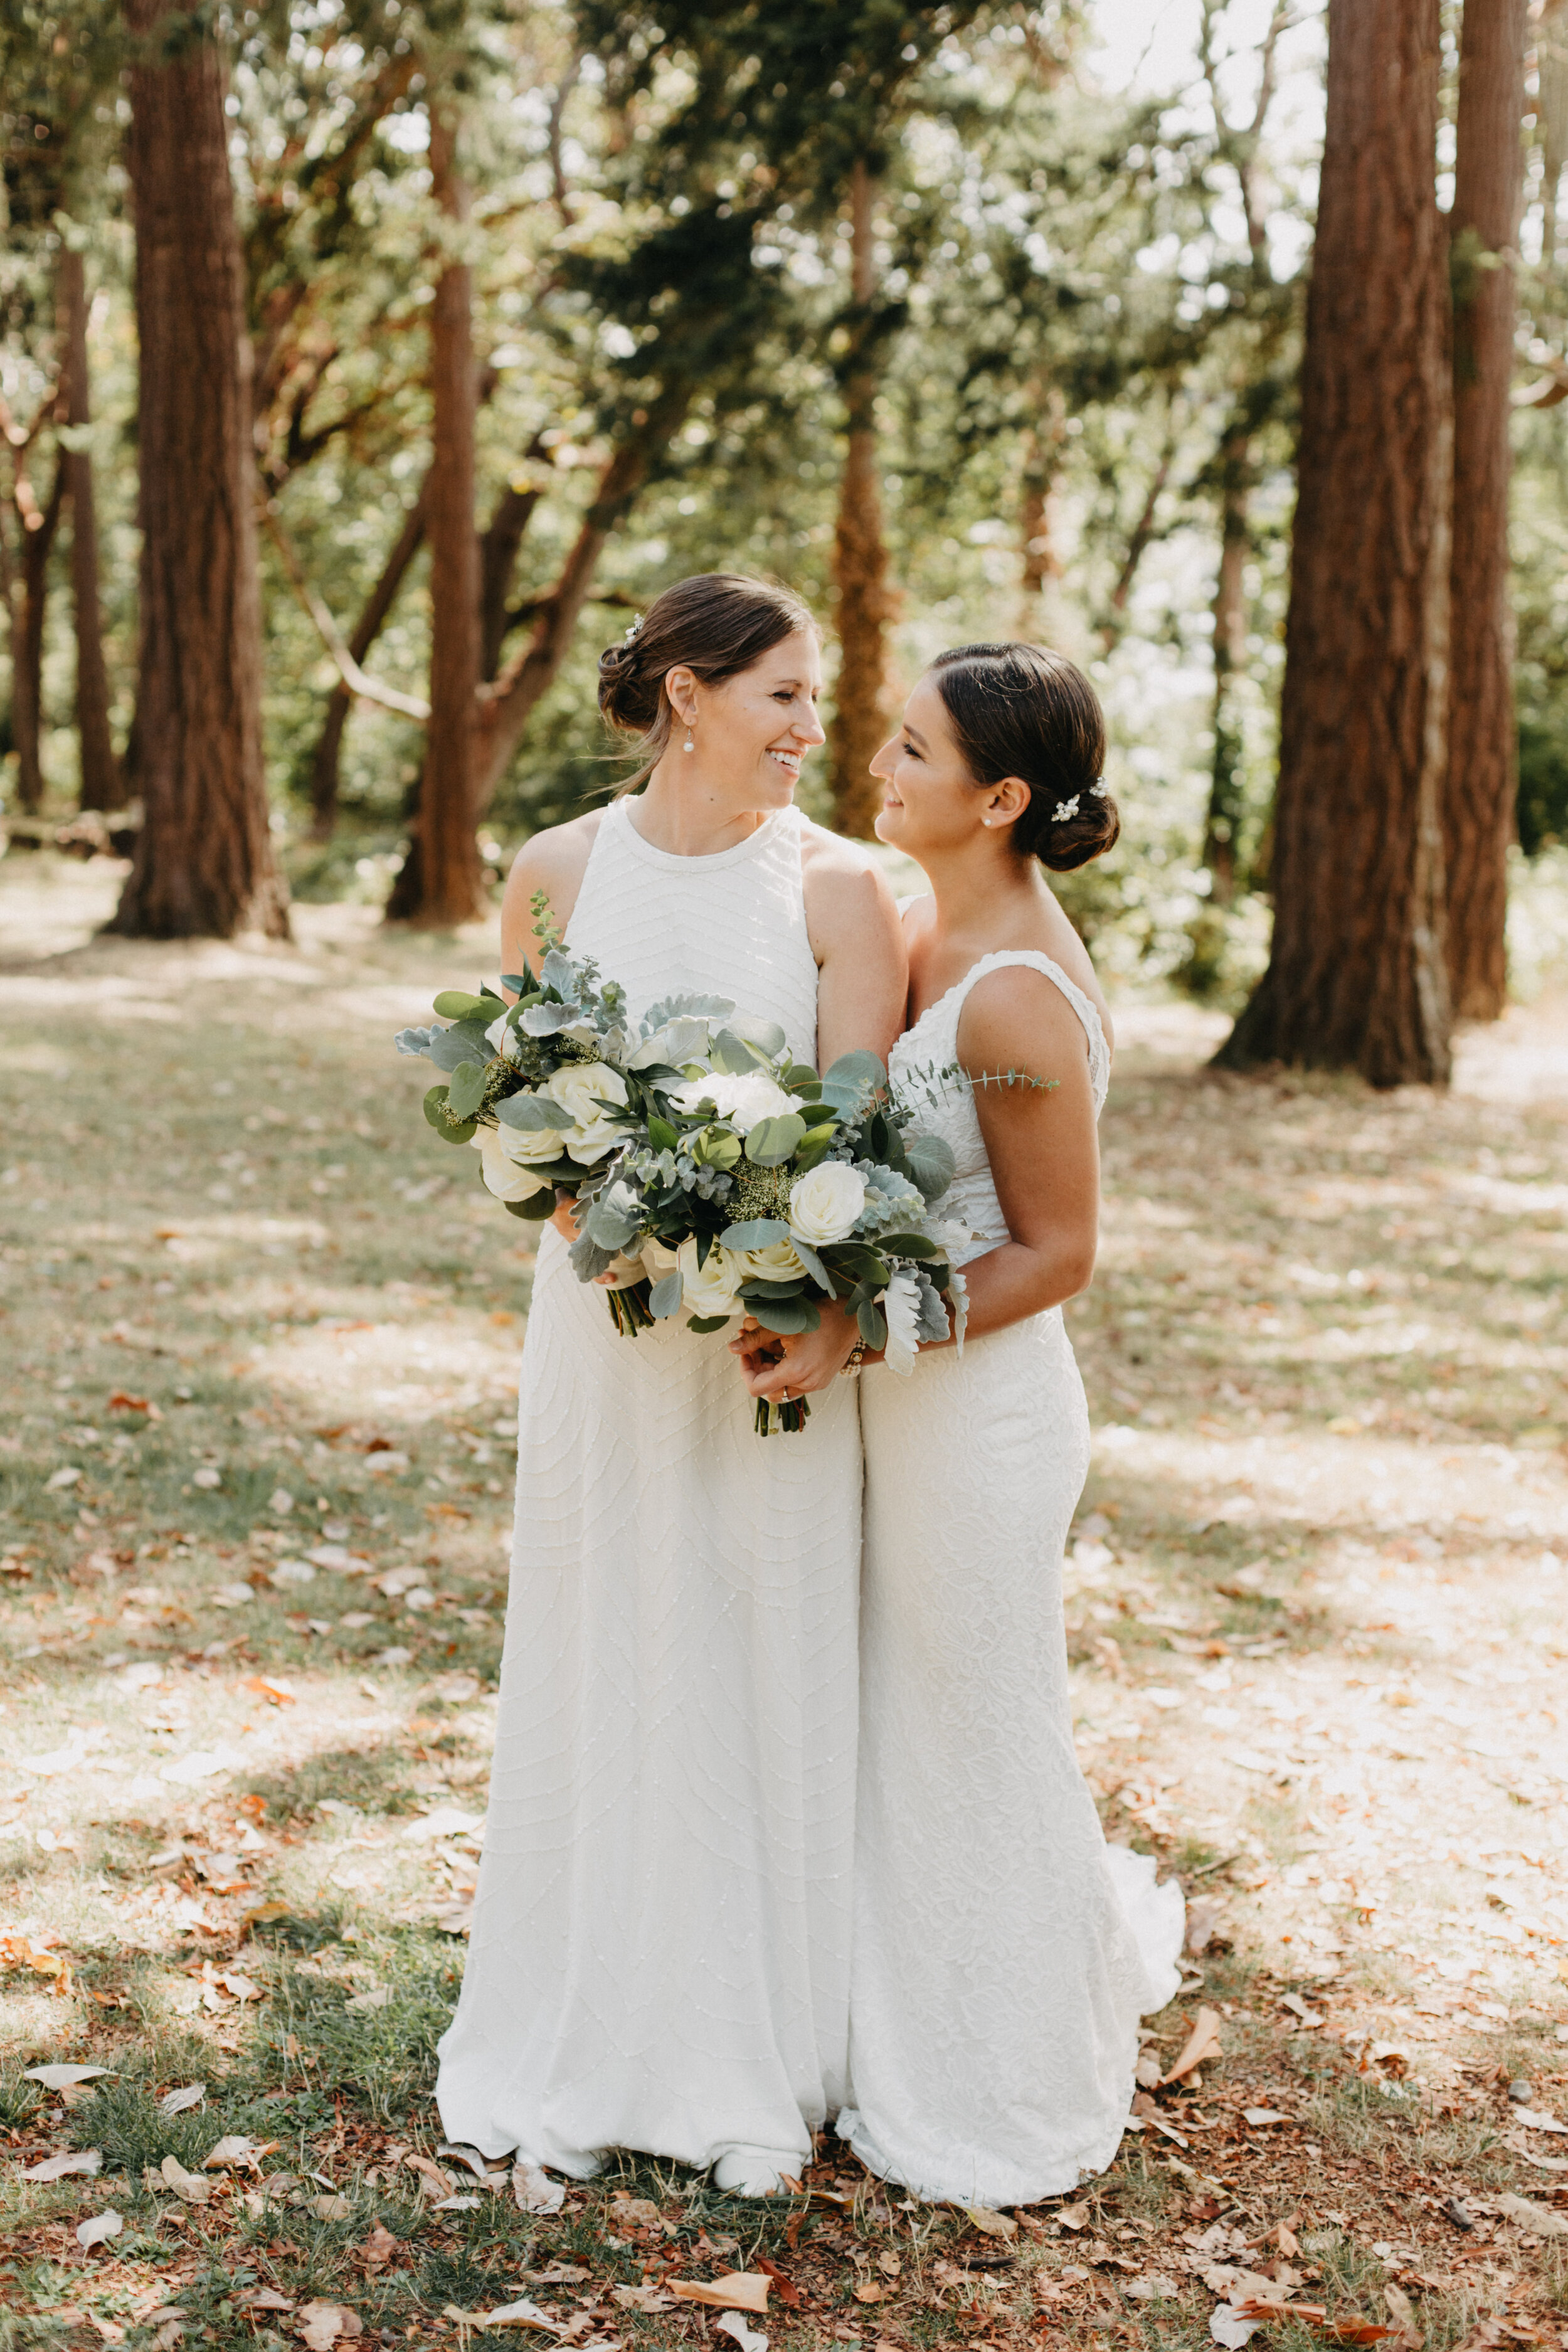 RISHA & KATIE - WEDDING